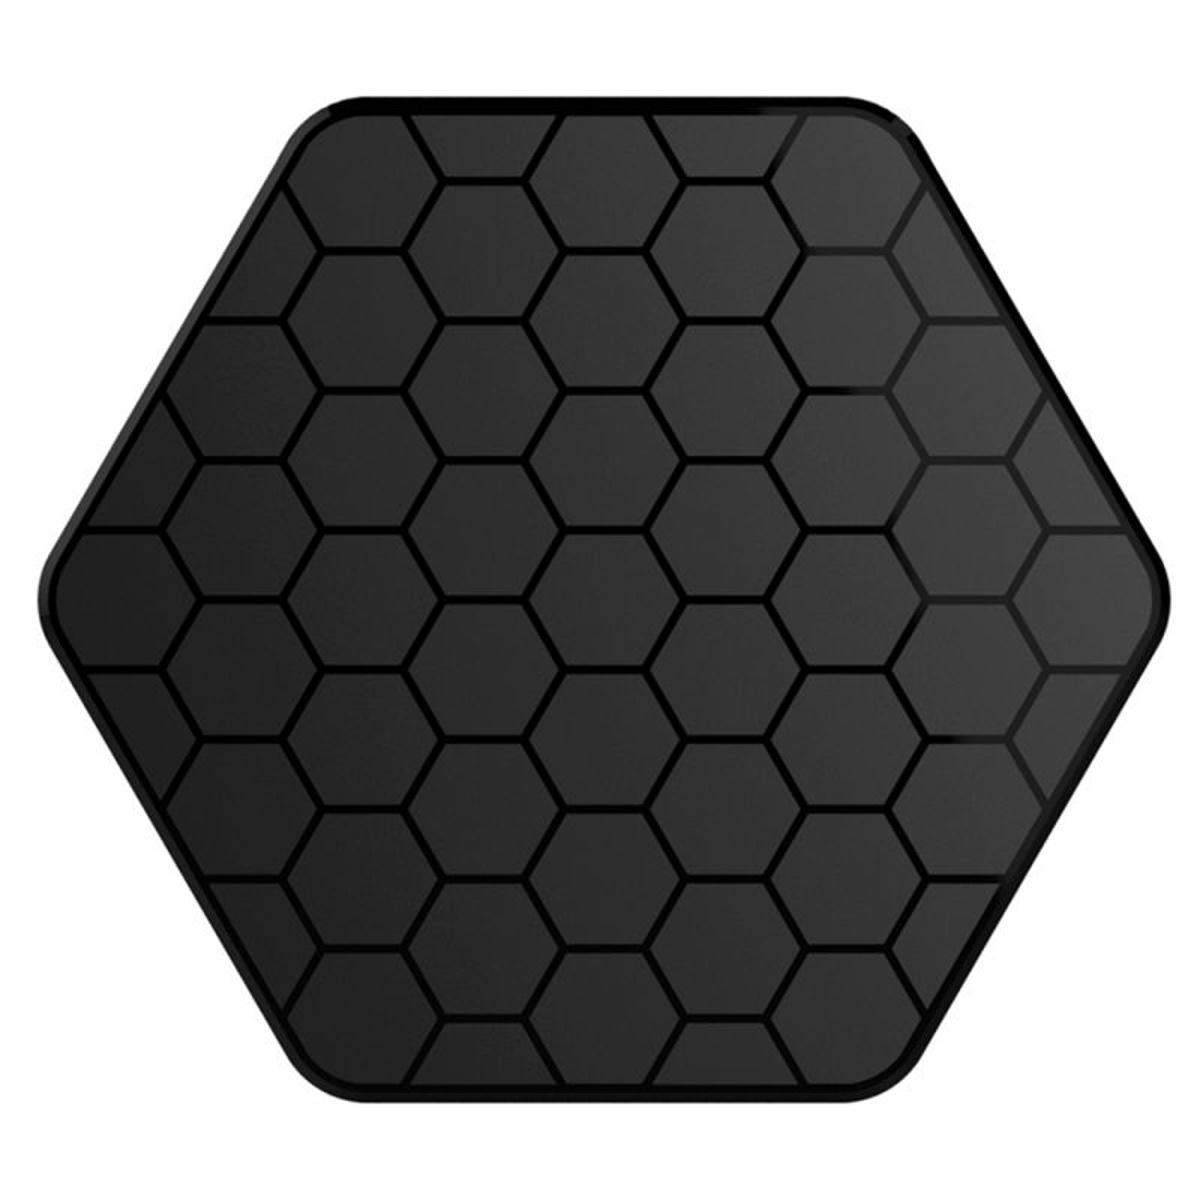 bon plan TV Box Android 6.0 UHD Octa Core 2.0 GHz Hexagone LED 4K Support Wifi 3D SD Noir